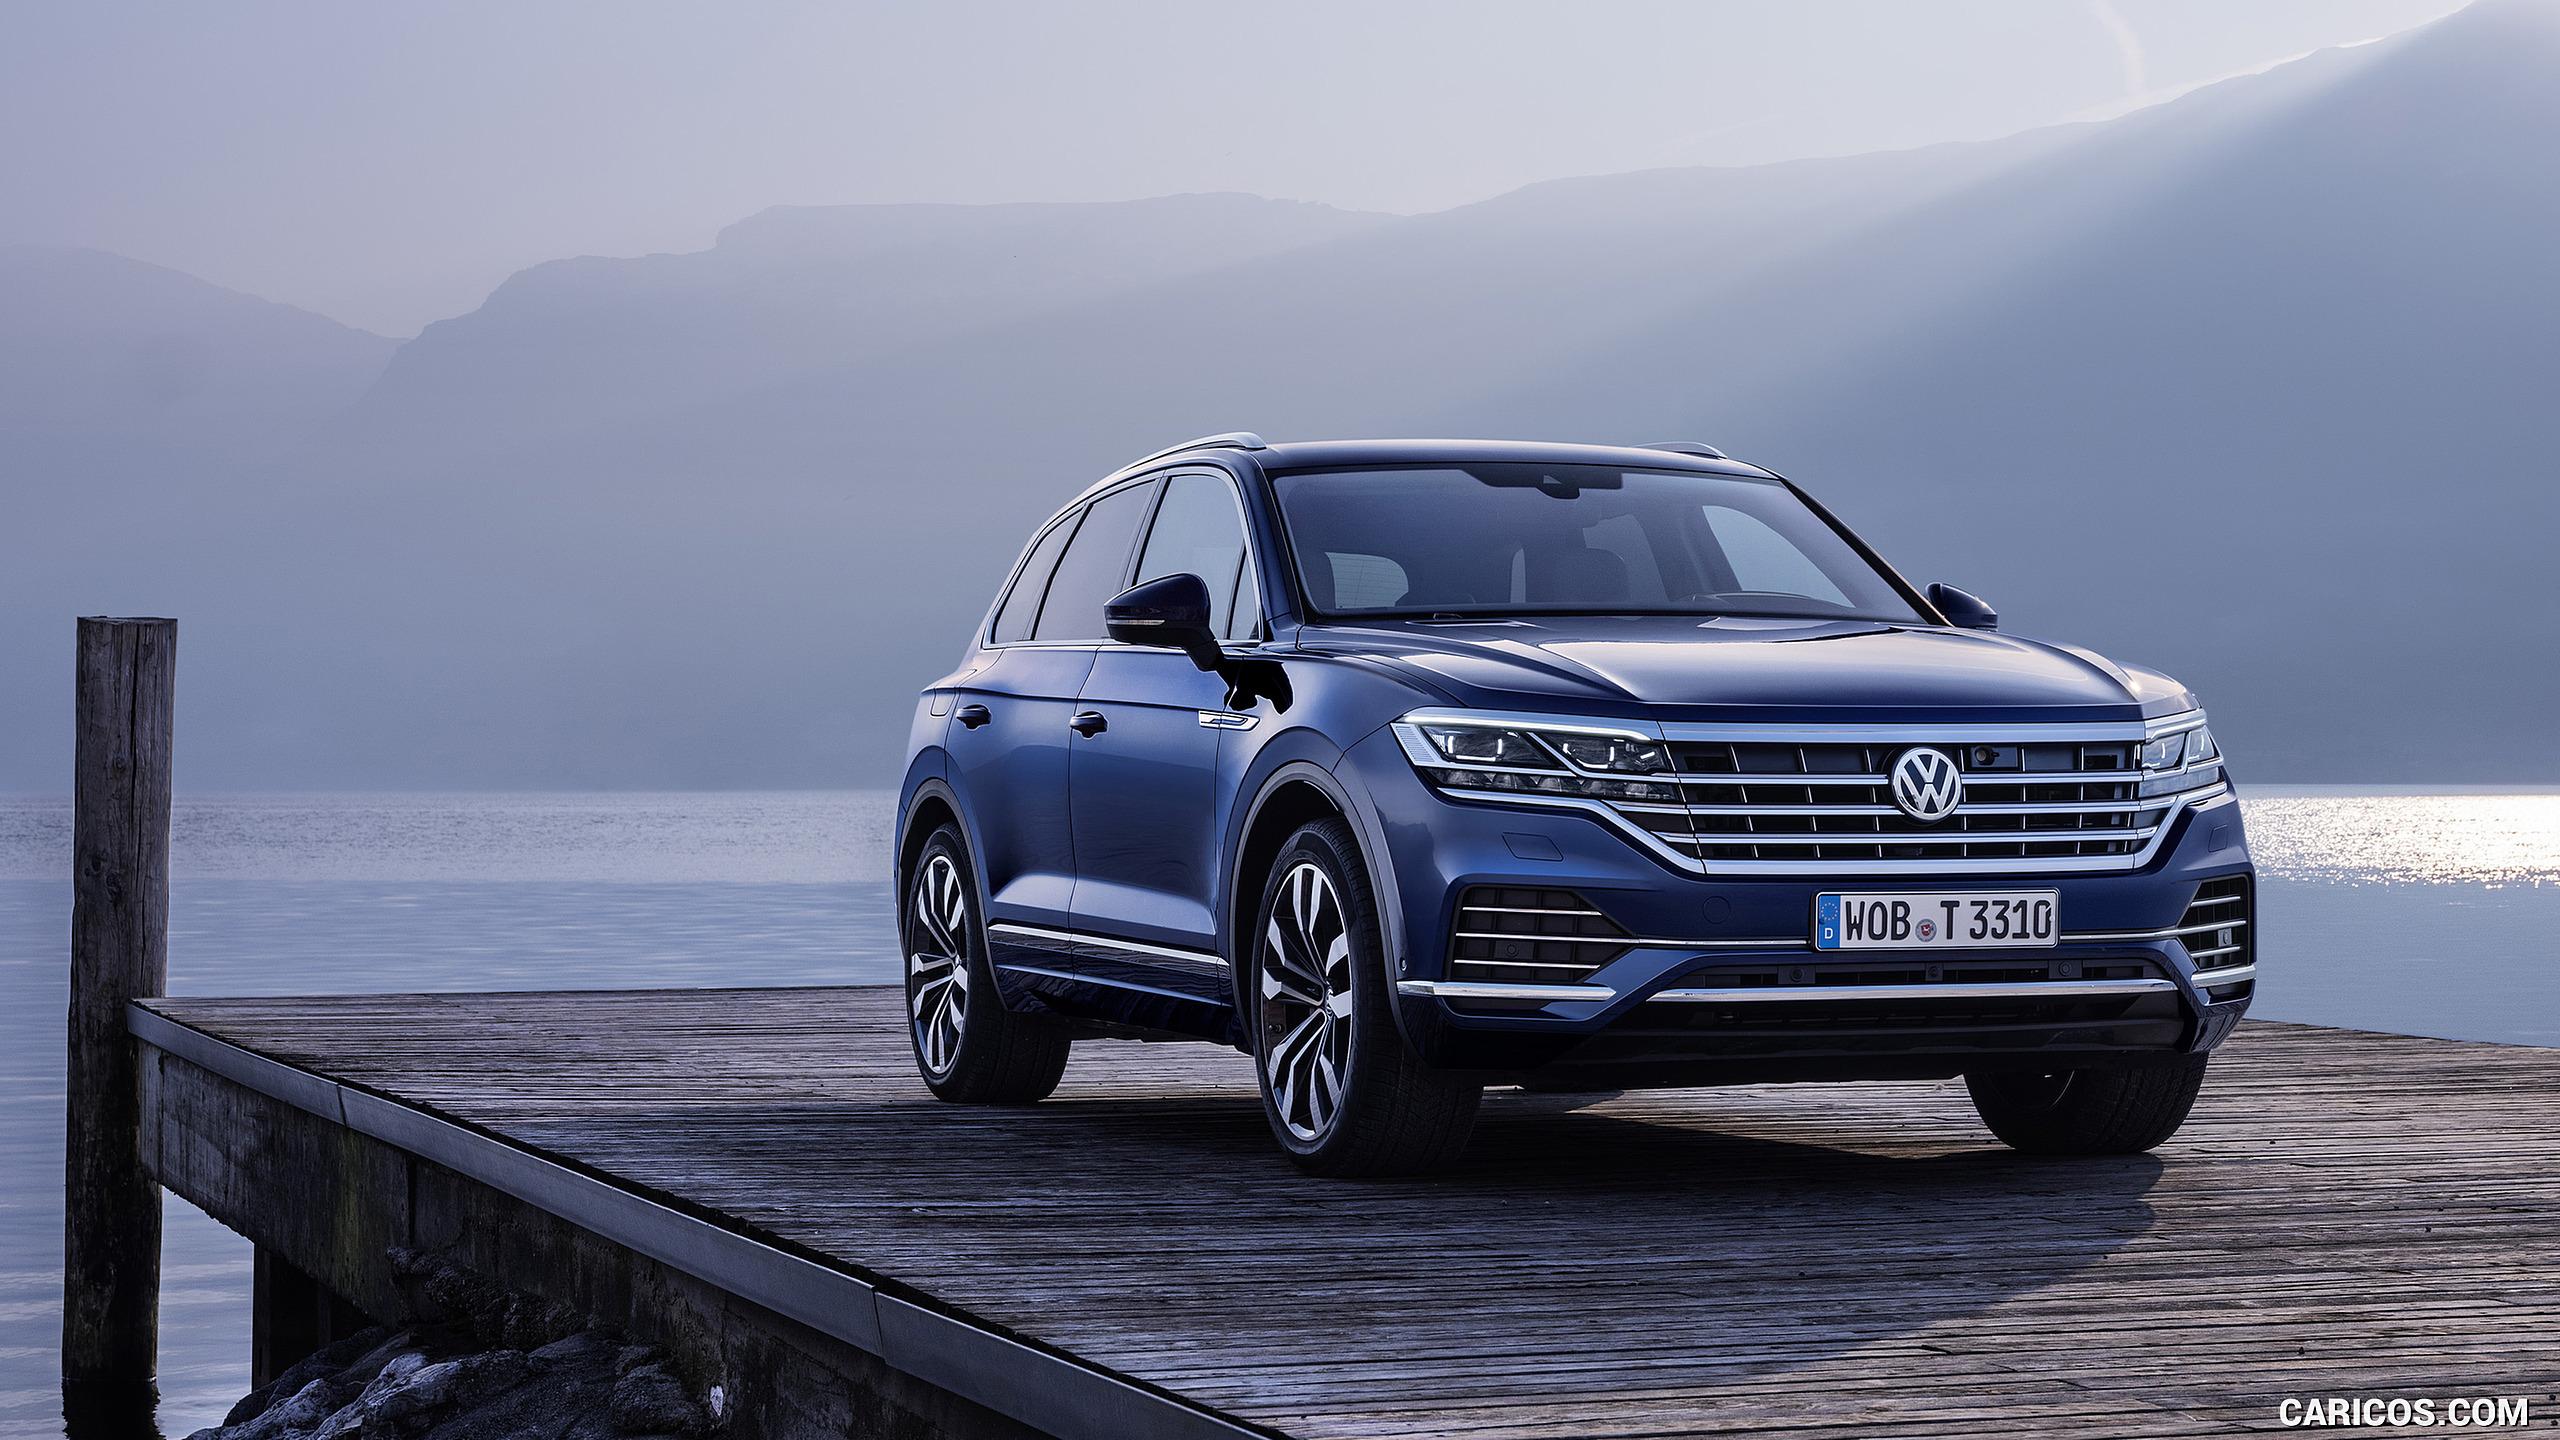 2019 Volkswagen Touareg Elegance   Front HD Wallpaper 78 2560x1440